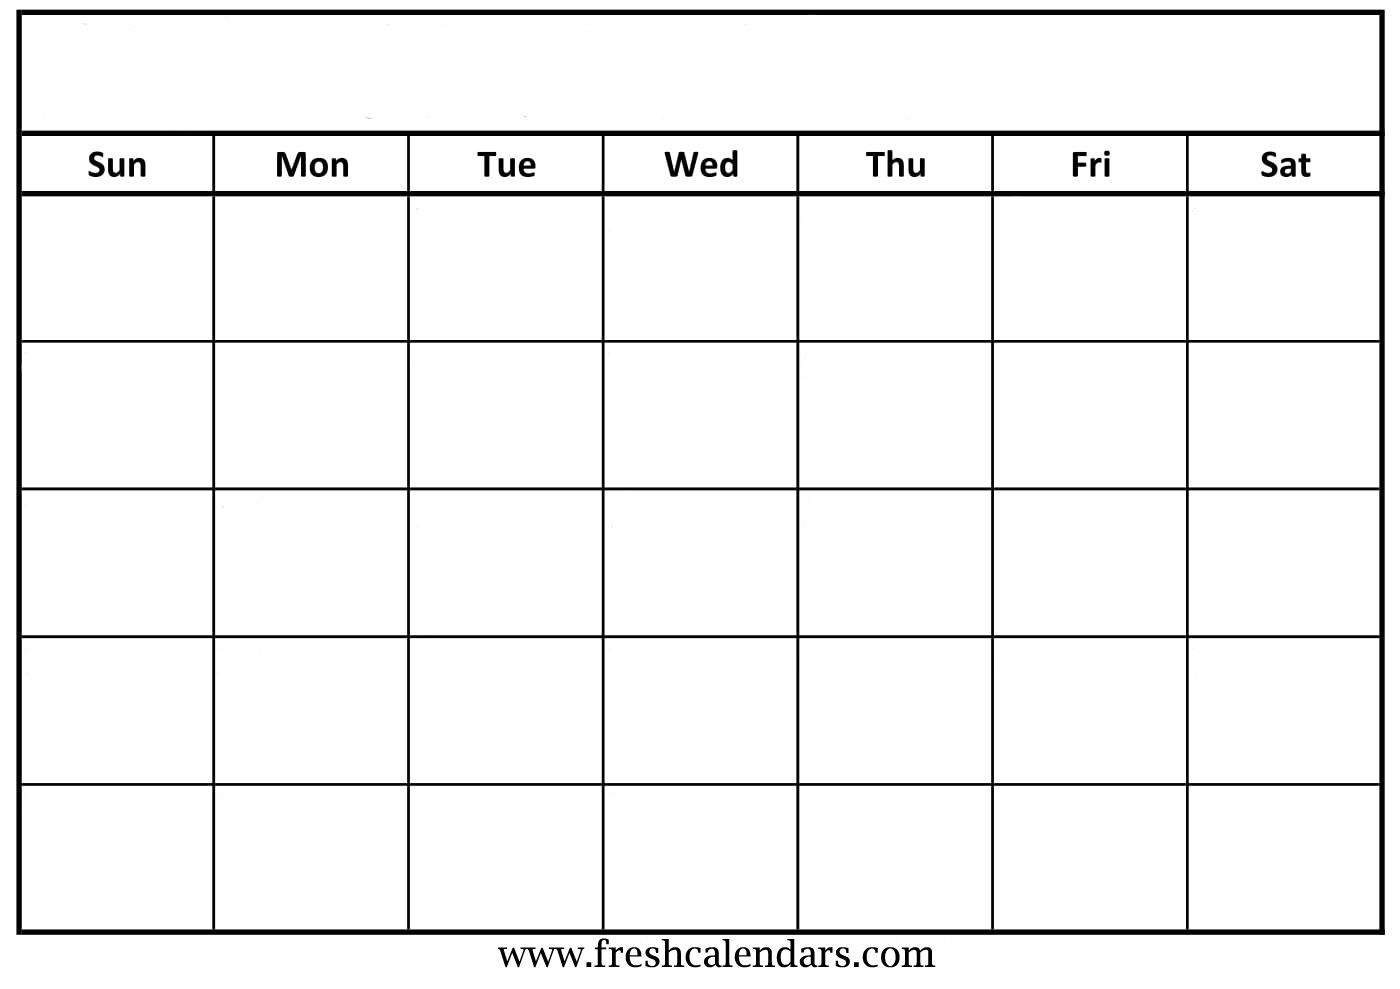 Blank Calendar: Wonderfully Printable 2019 Templates Calendar Blank To Print